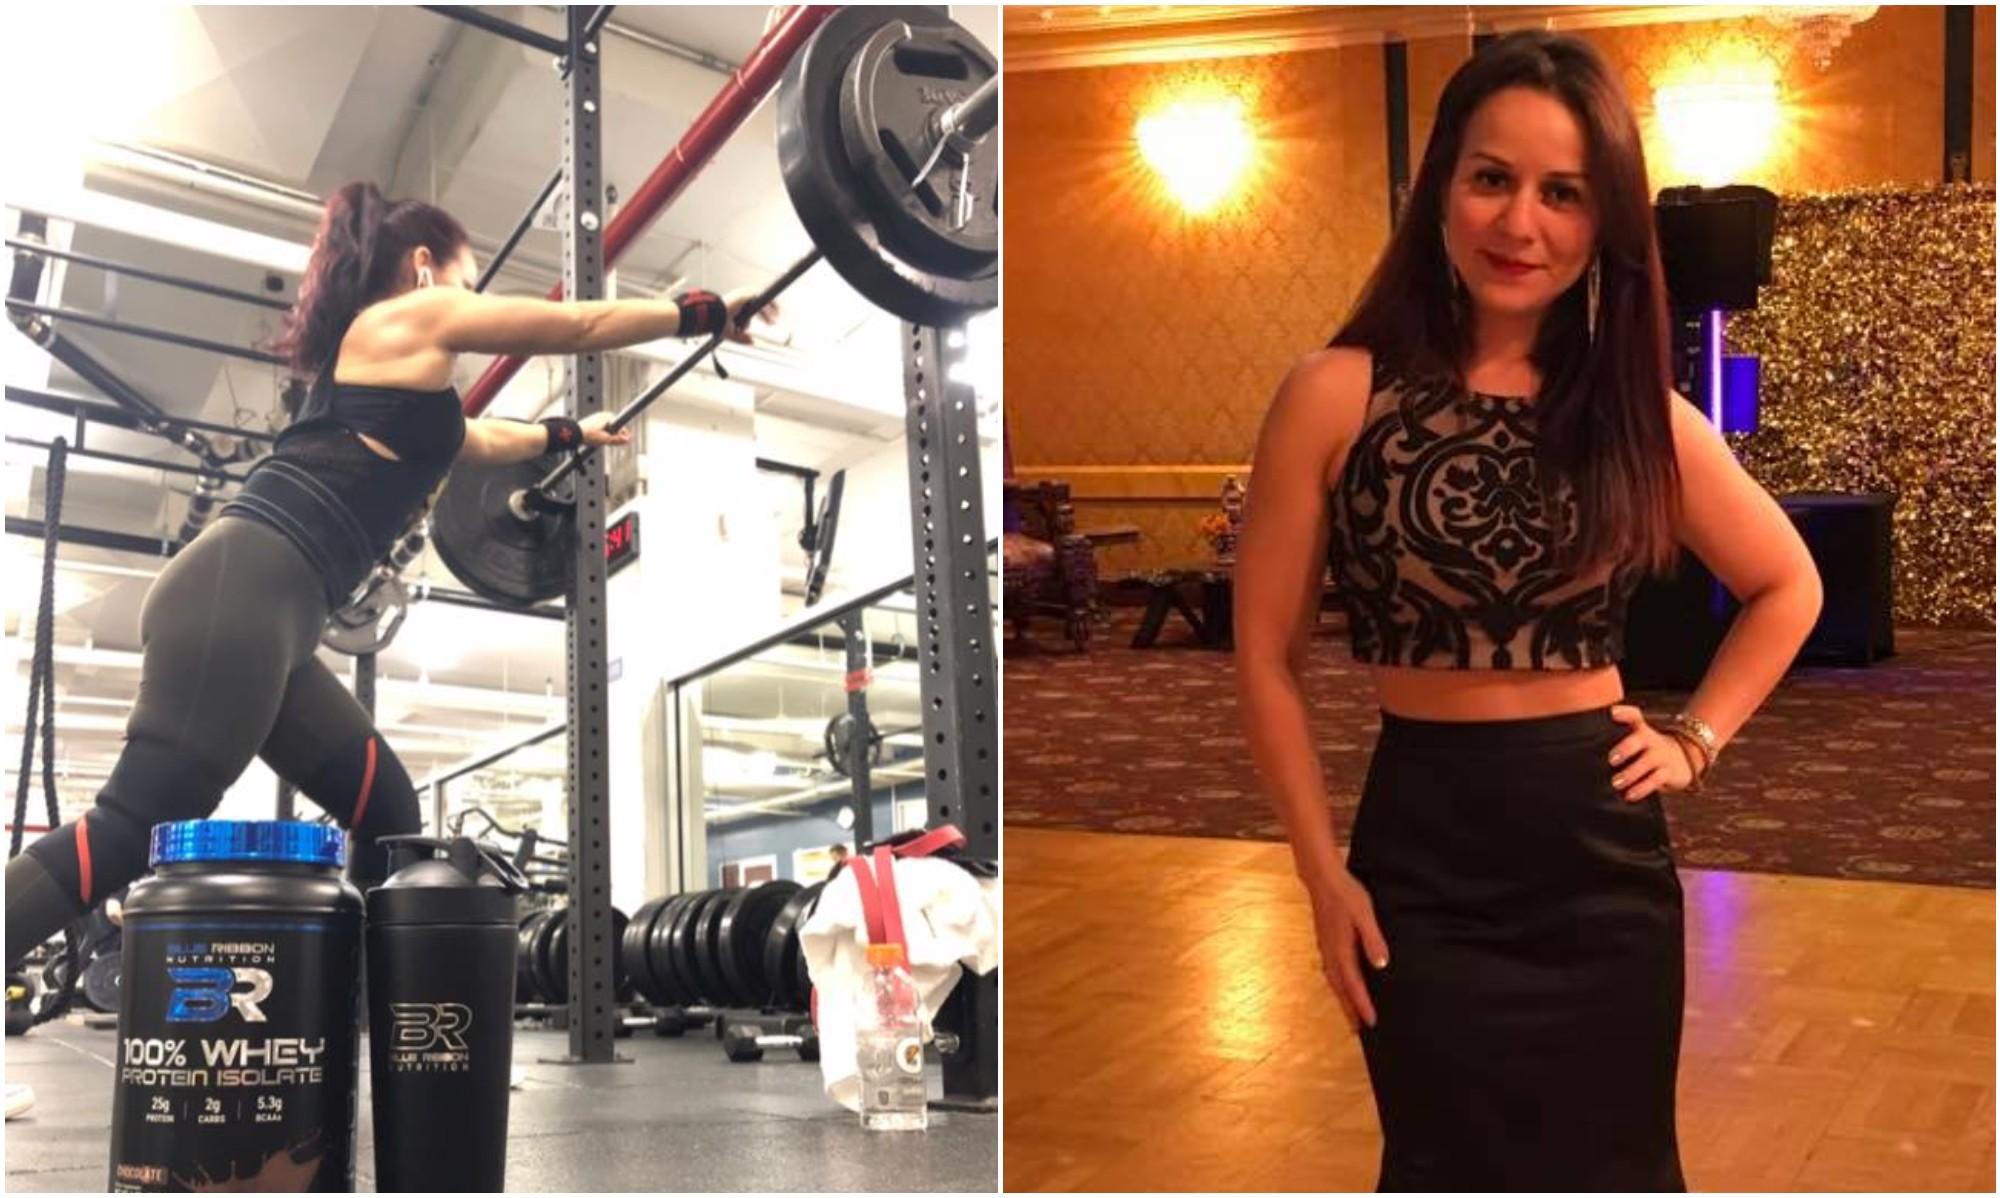 Hondureña compite para ser portada de Muscle & Fitness Hers Magazine